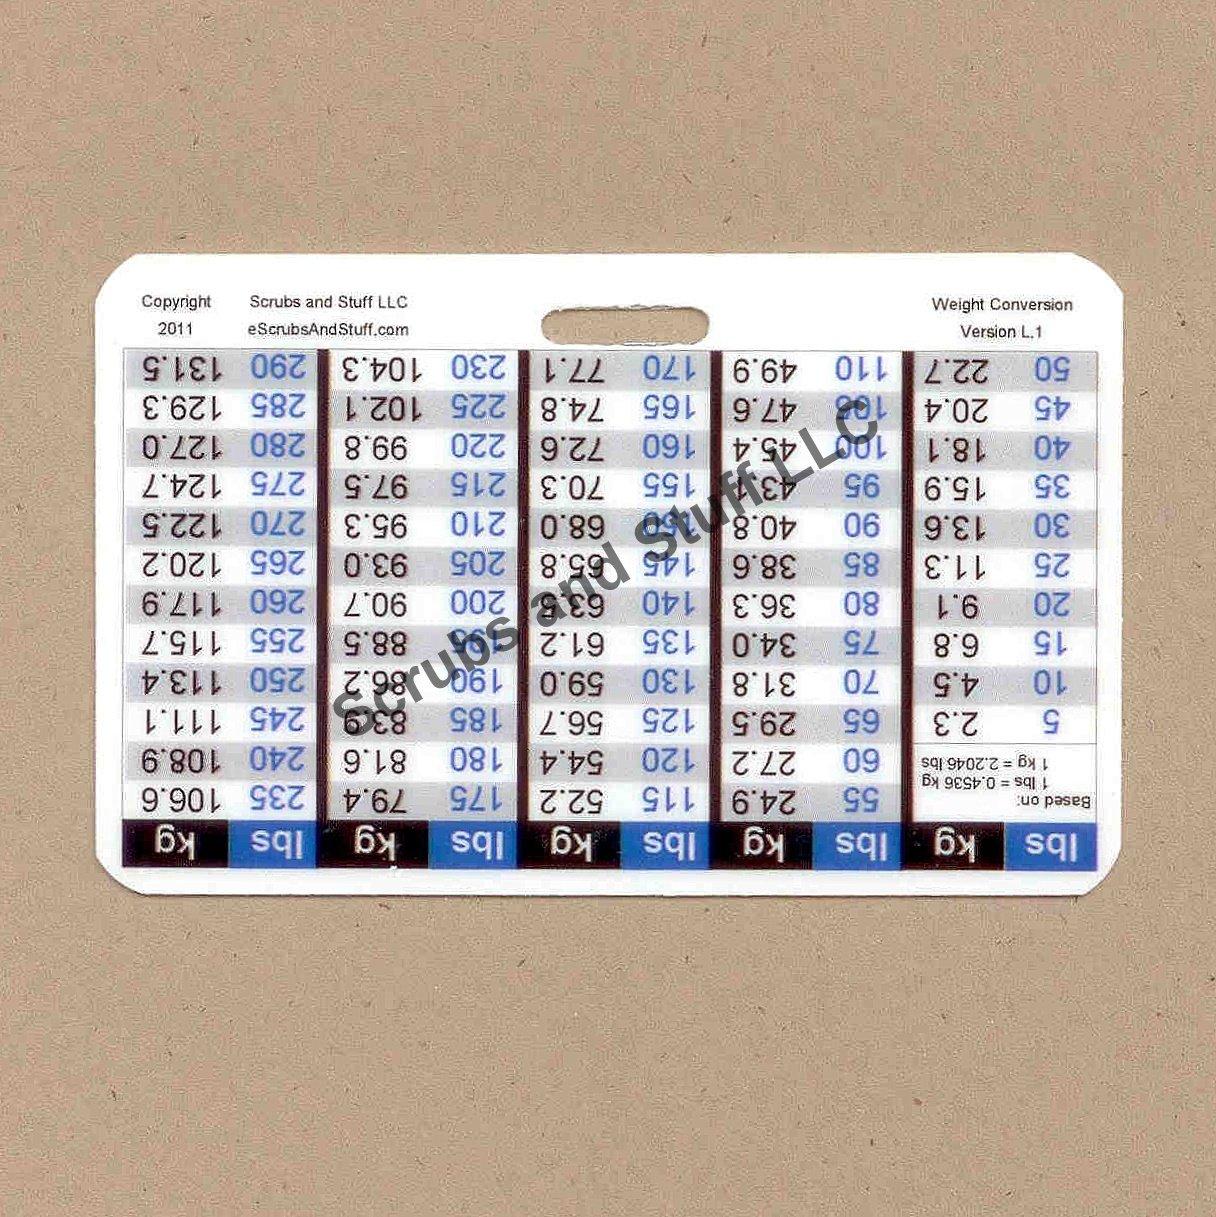 Weight Conversion Badge Card Horizontal Upside-down Version General Range